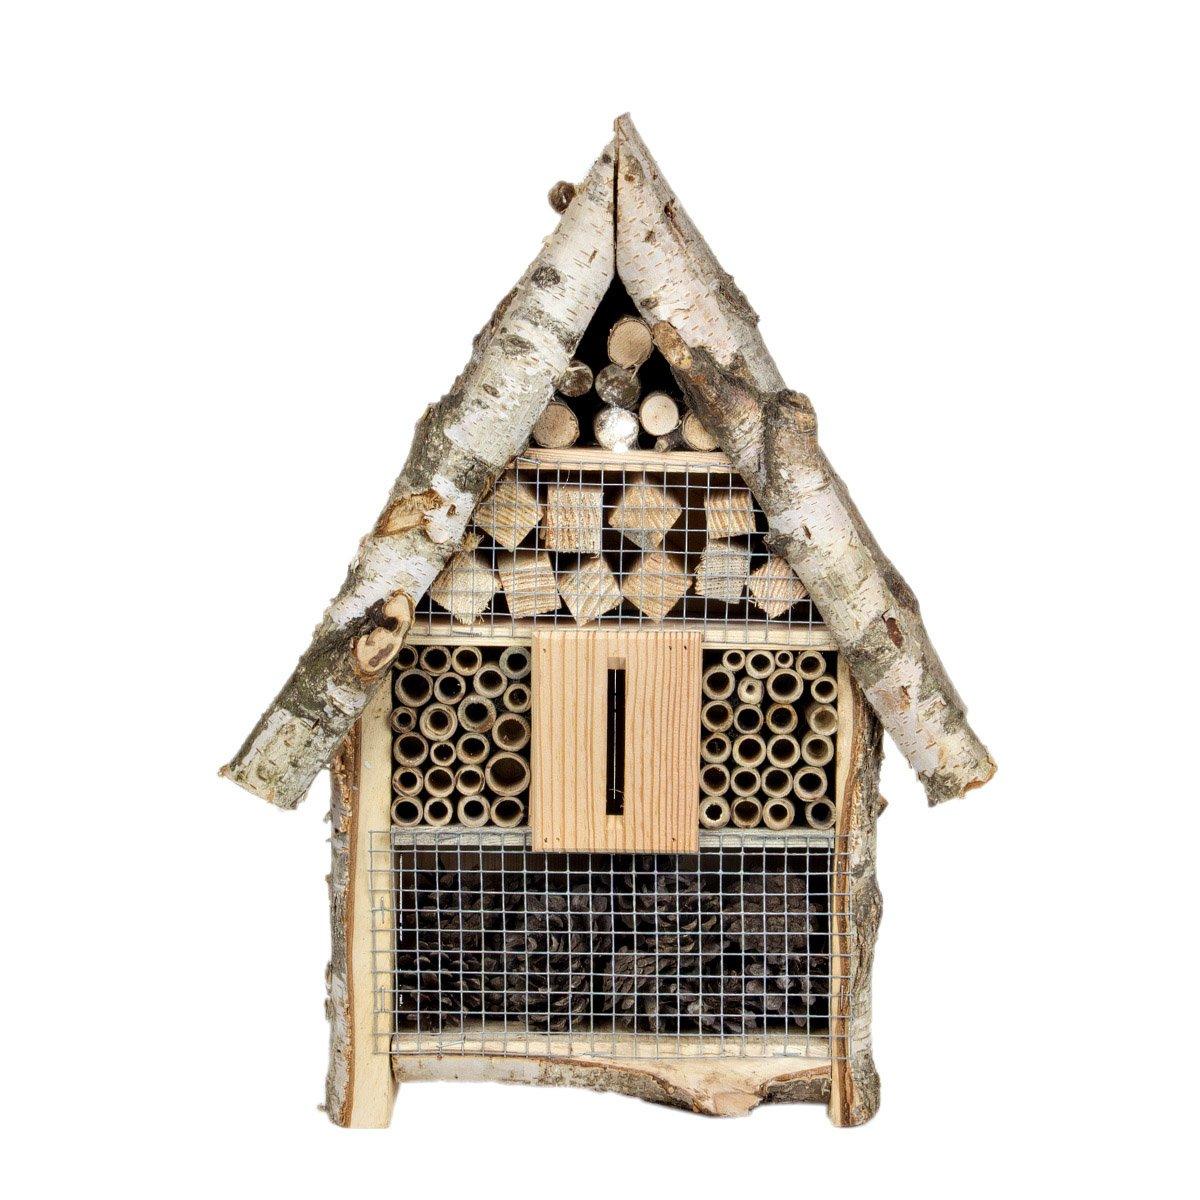 Bienenhaus Futterstelle XL Insektenhaus Insektenhotel Holz Nistkasten Magic Wood Sp. z o.o.